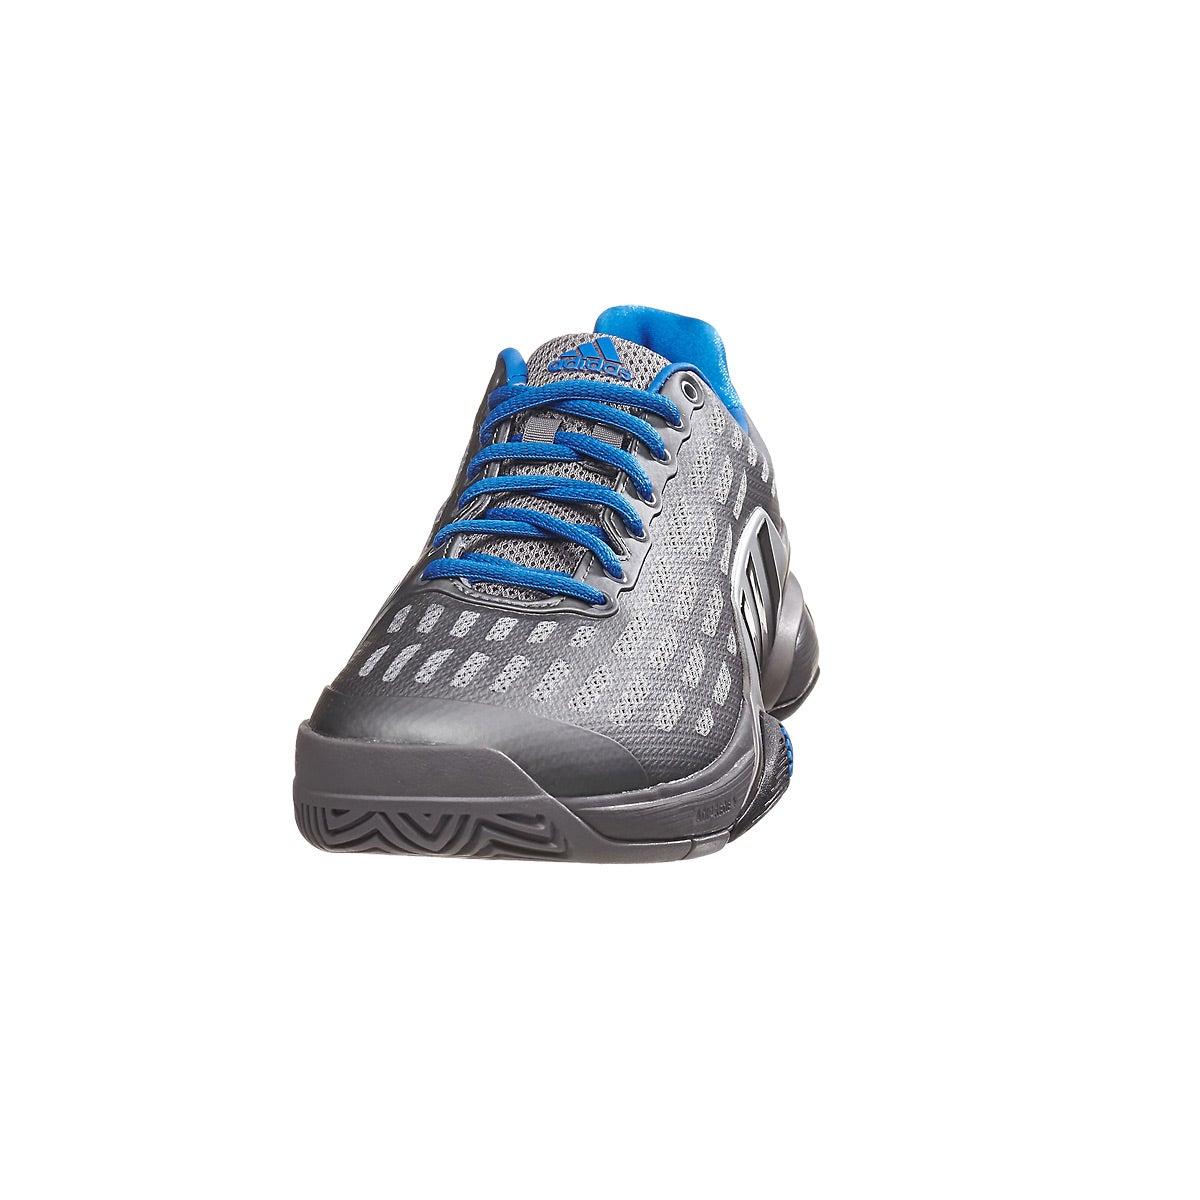 adidas Barricade 2016 Grey/Royal Men's Shoe 360° View